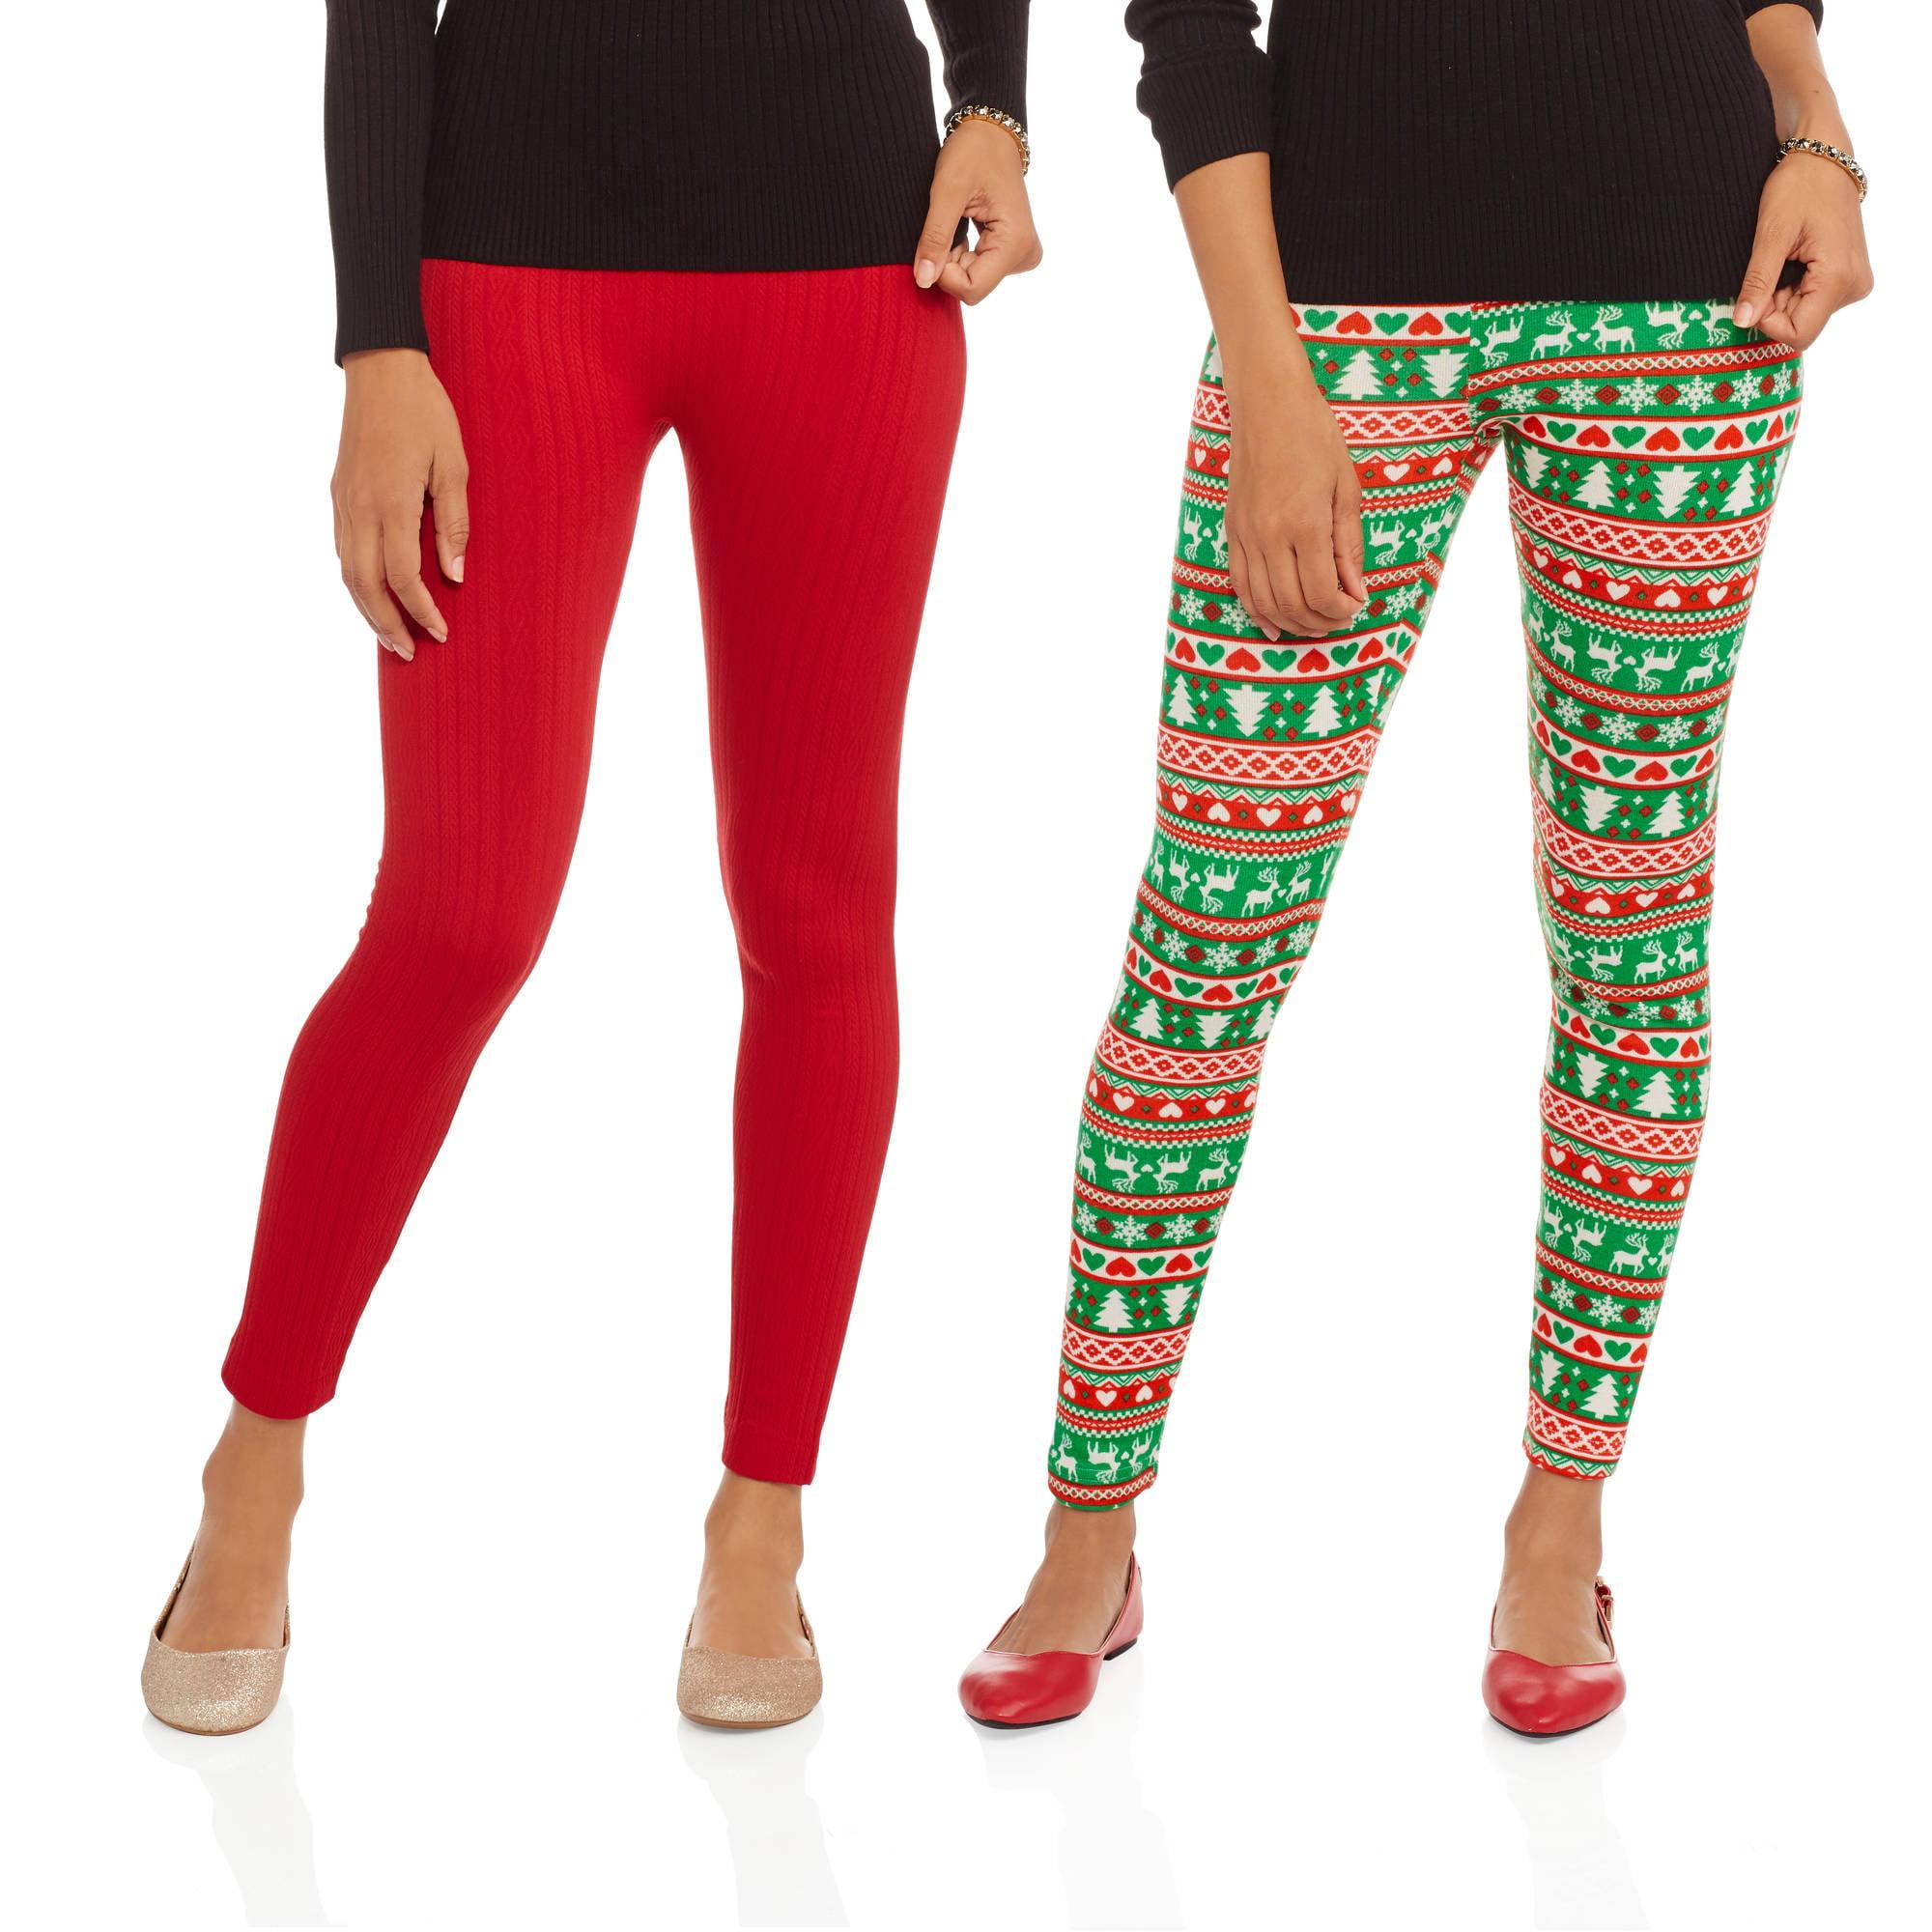 92173641ae8017 Juniors' Holiday Fleece Lined Leggings, 2-Pack – Walmart Inventory ...